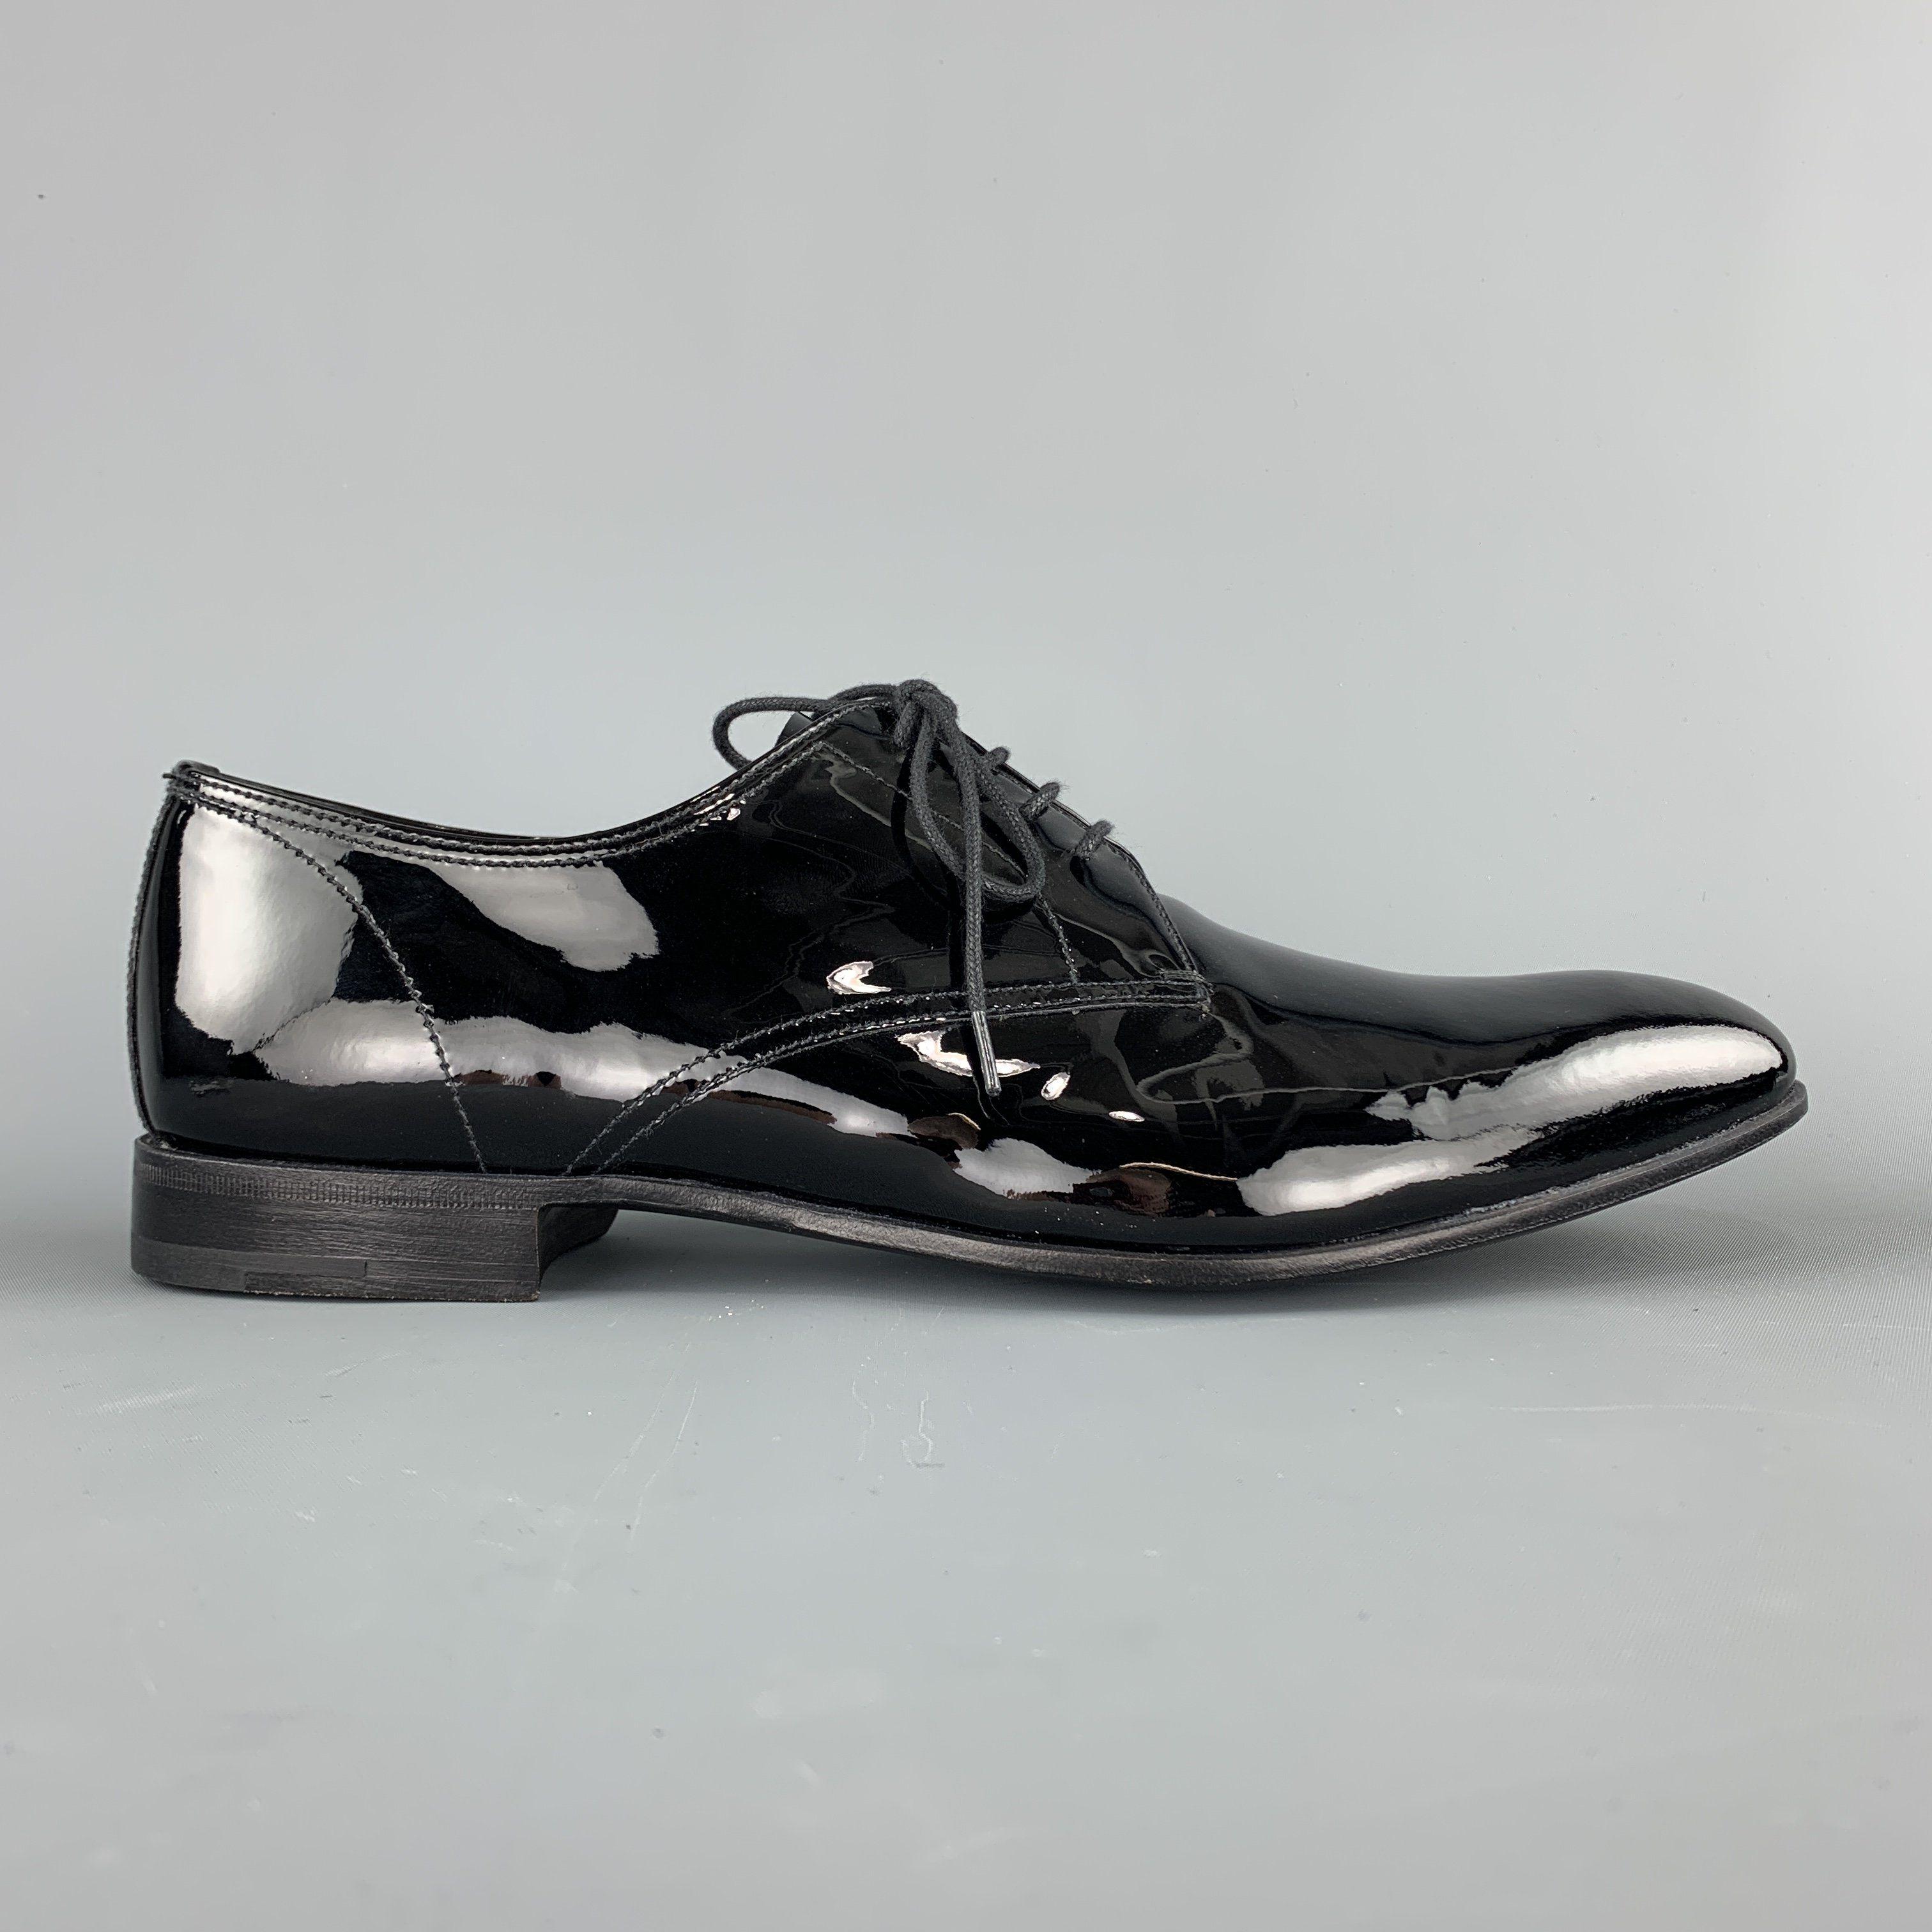 Prada Size 9.5 Black Patent Leather